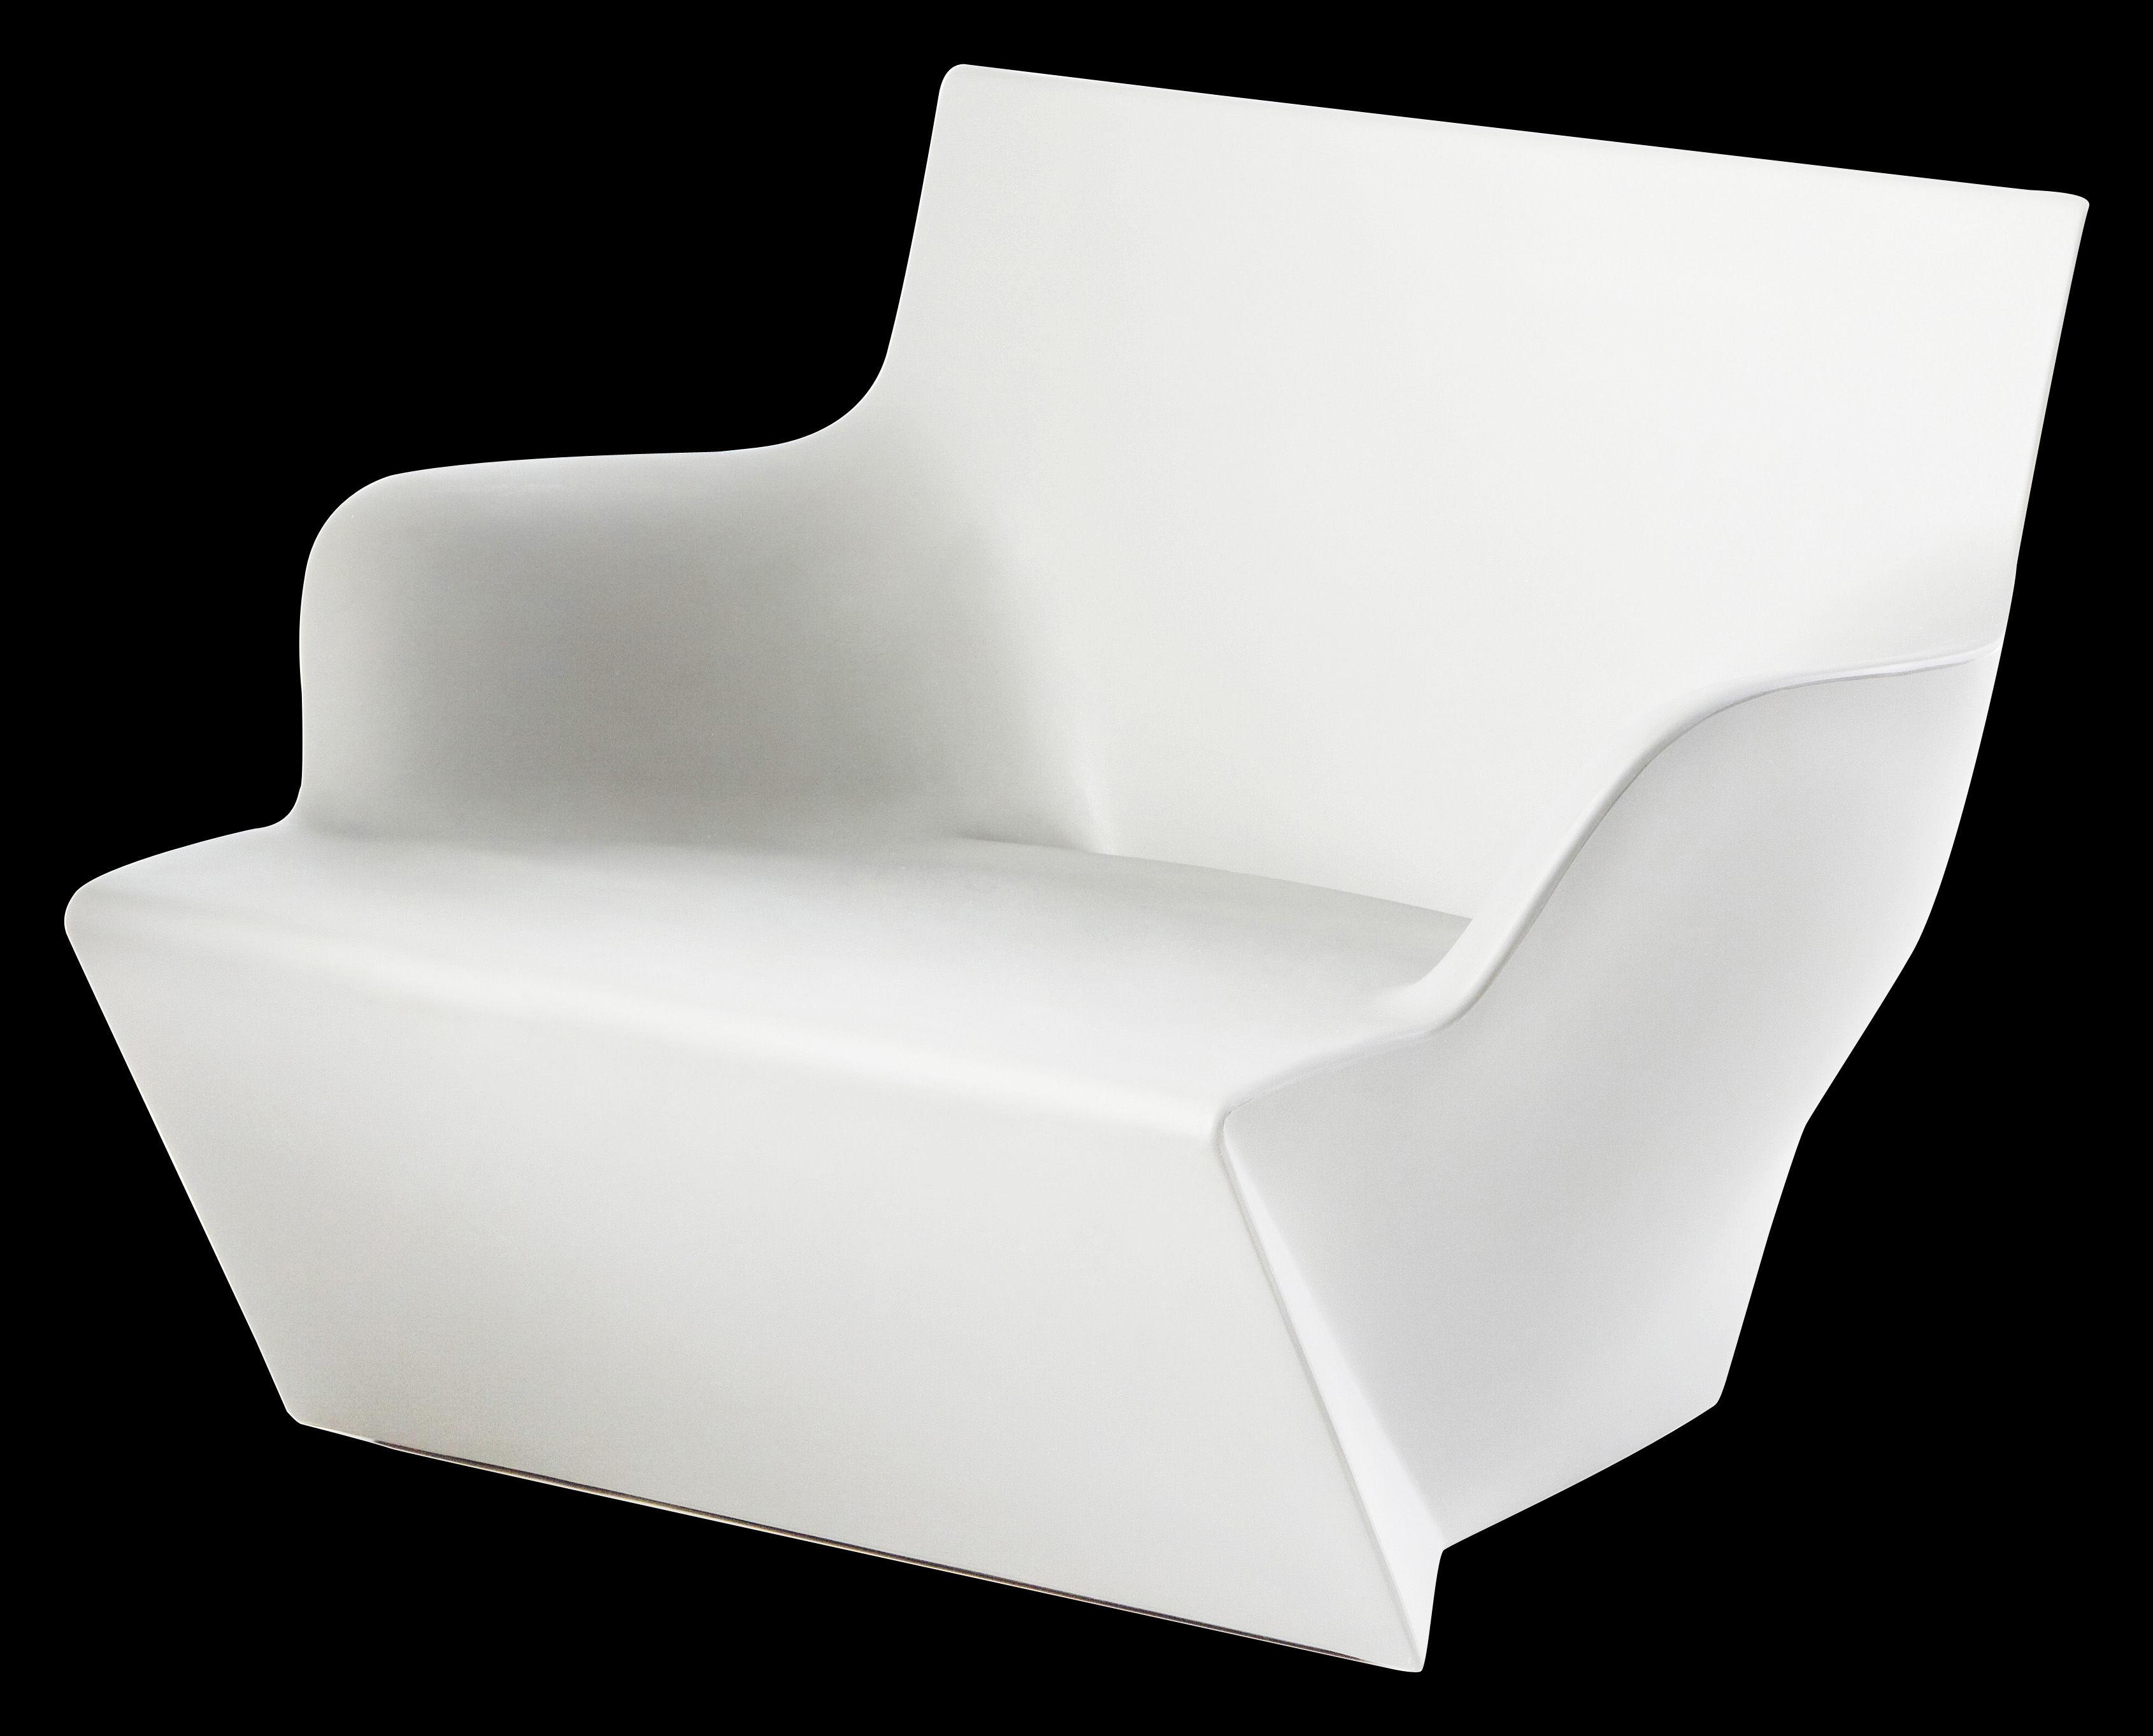 Arredamento - Mobili luminosi - Poltrona luminosa Kami San - /Luminosa di Slide - Bianco luminoso - polietilene riciclabile